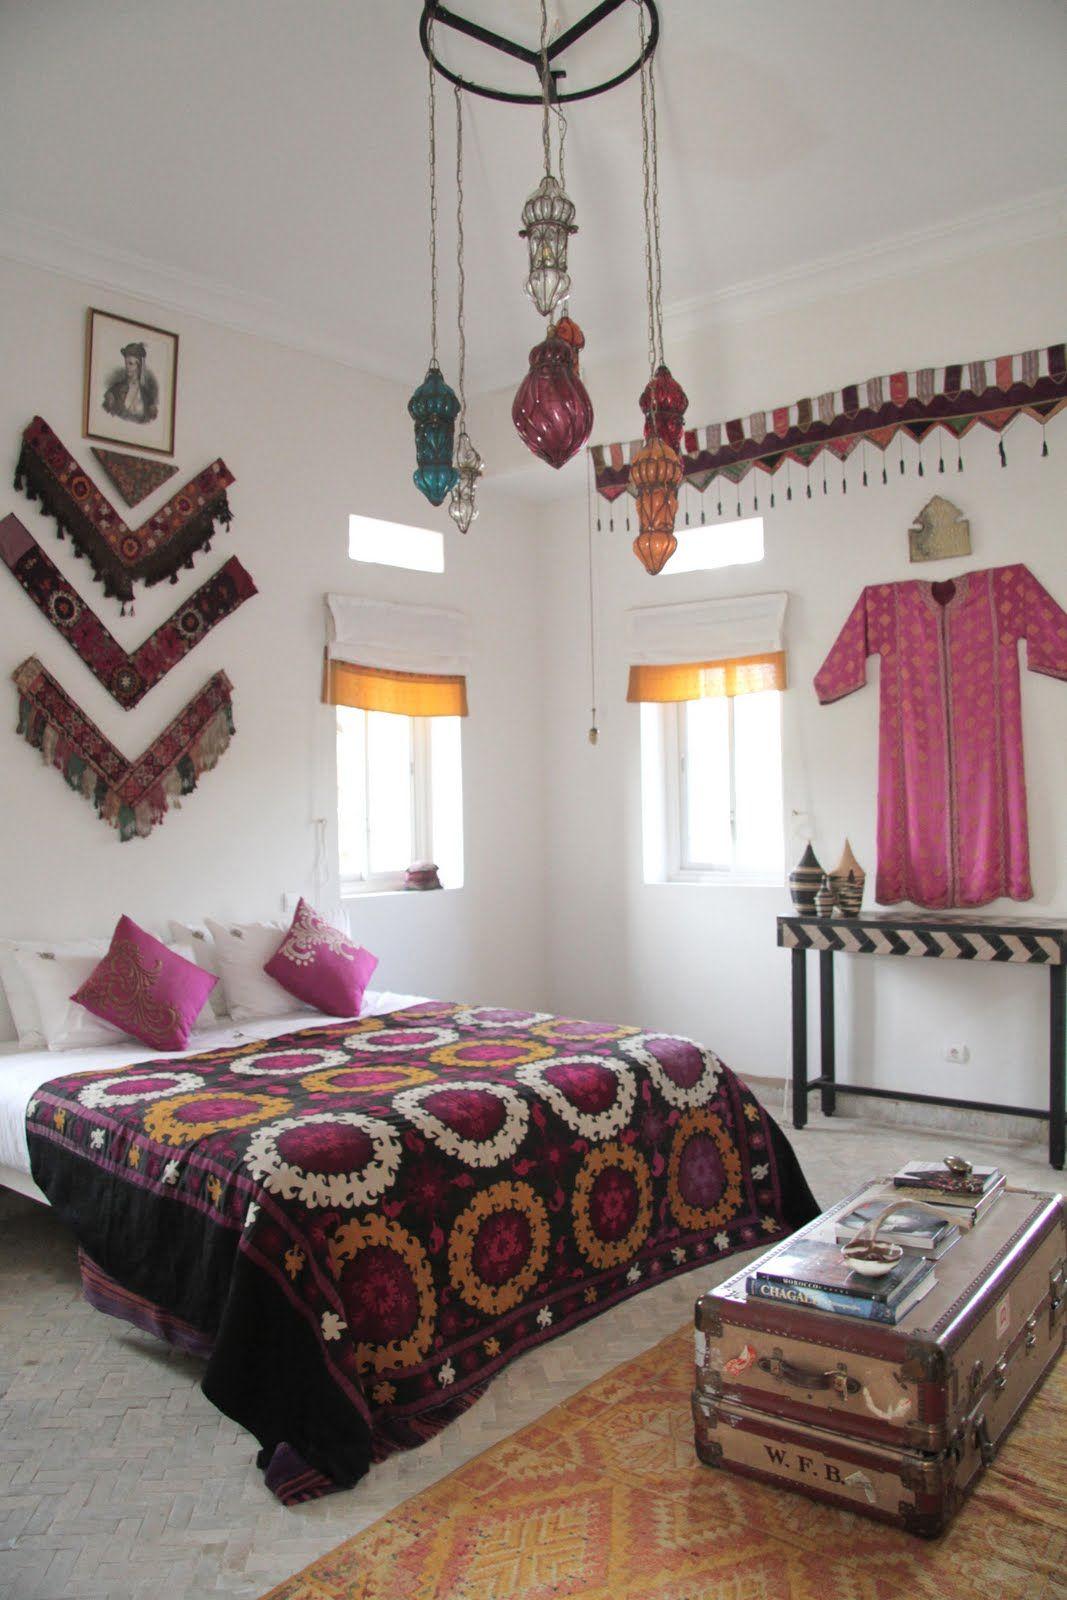 Modern bohemian home decor  Interior Design Tips For Everyone To Use  Useful Home Decor Tips